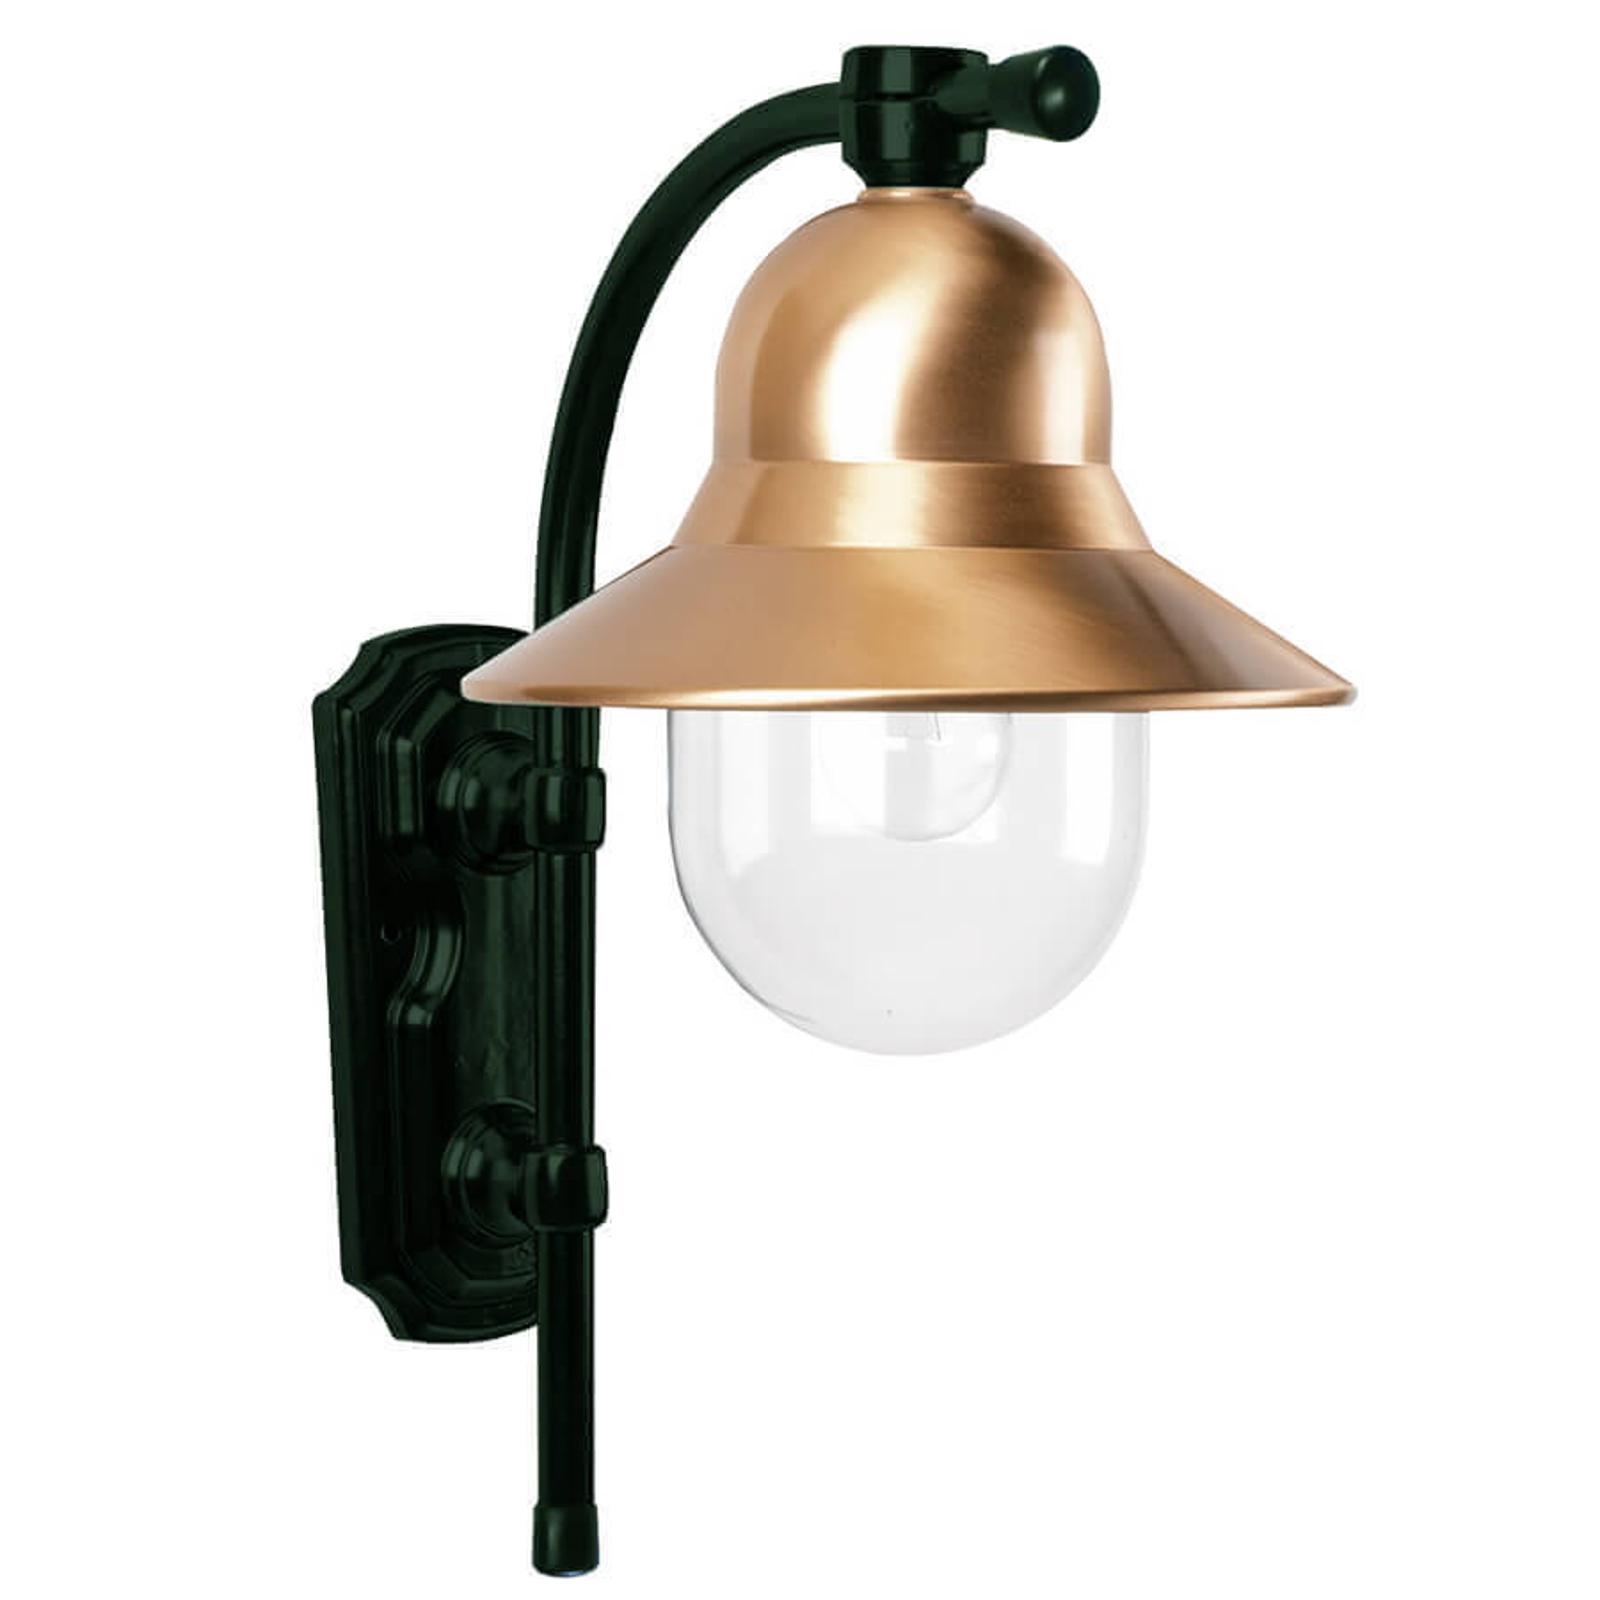 Tijdloze buitenwandlamp Toscane, groen